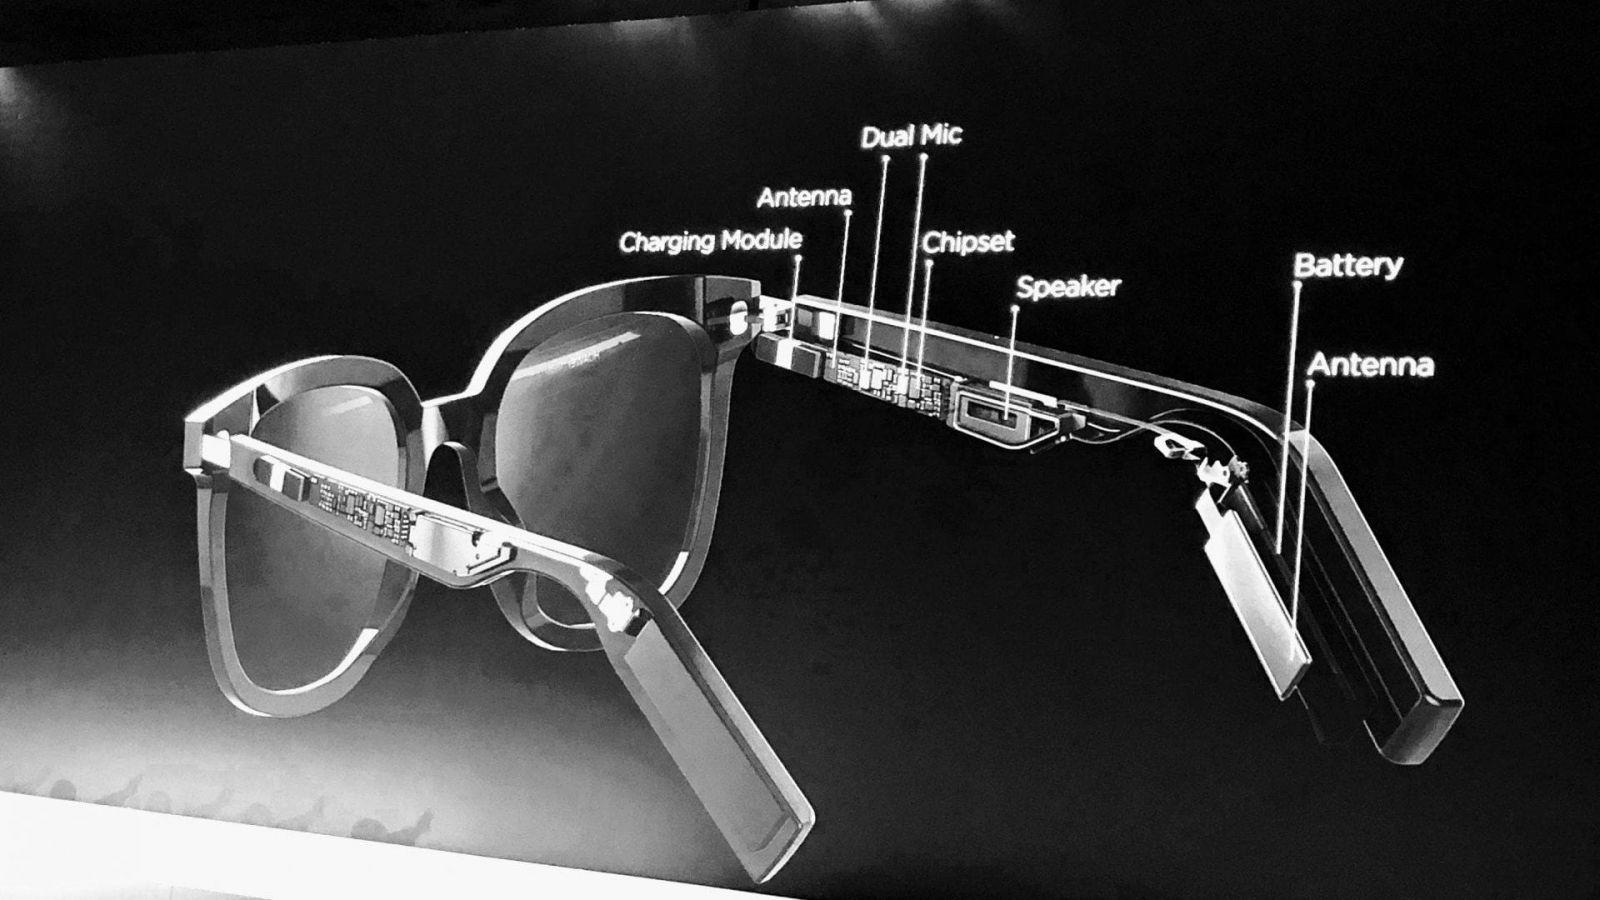 Huawei работает с Gentle Monster над модными умными очками без камеры (huawei gentle monster glasses tech)